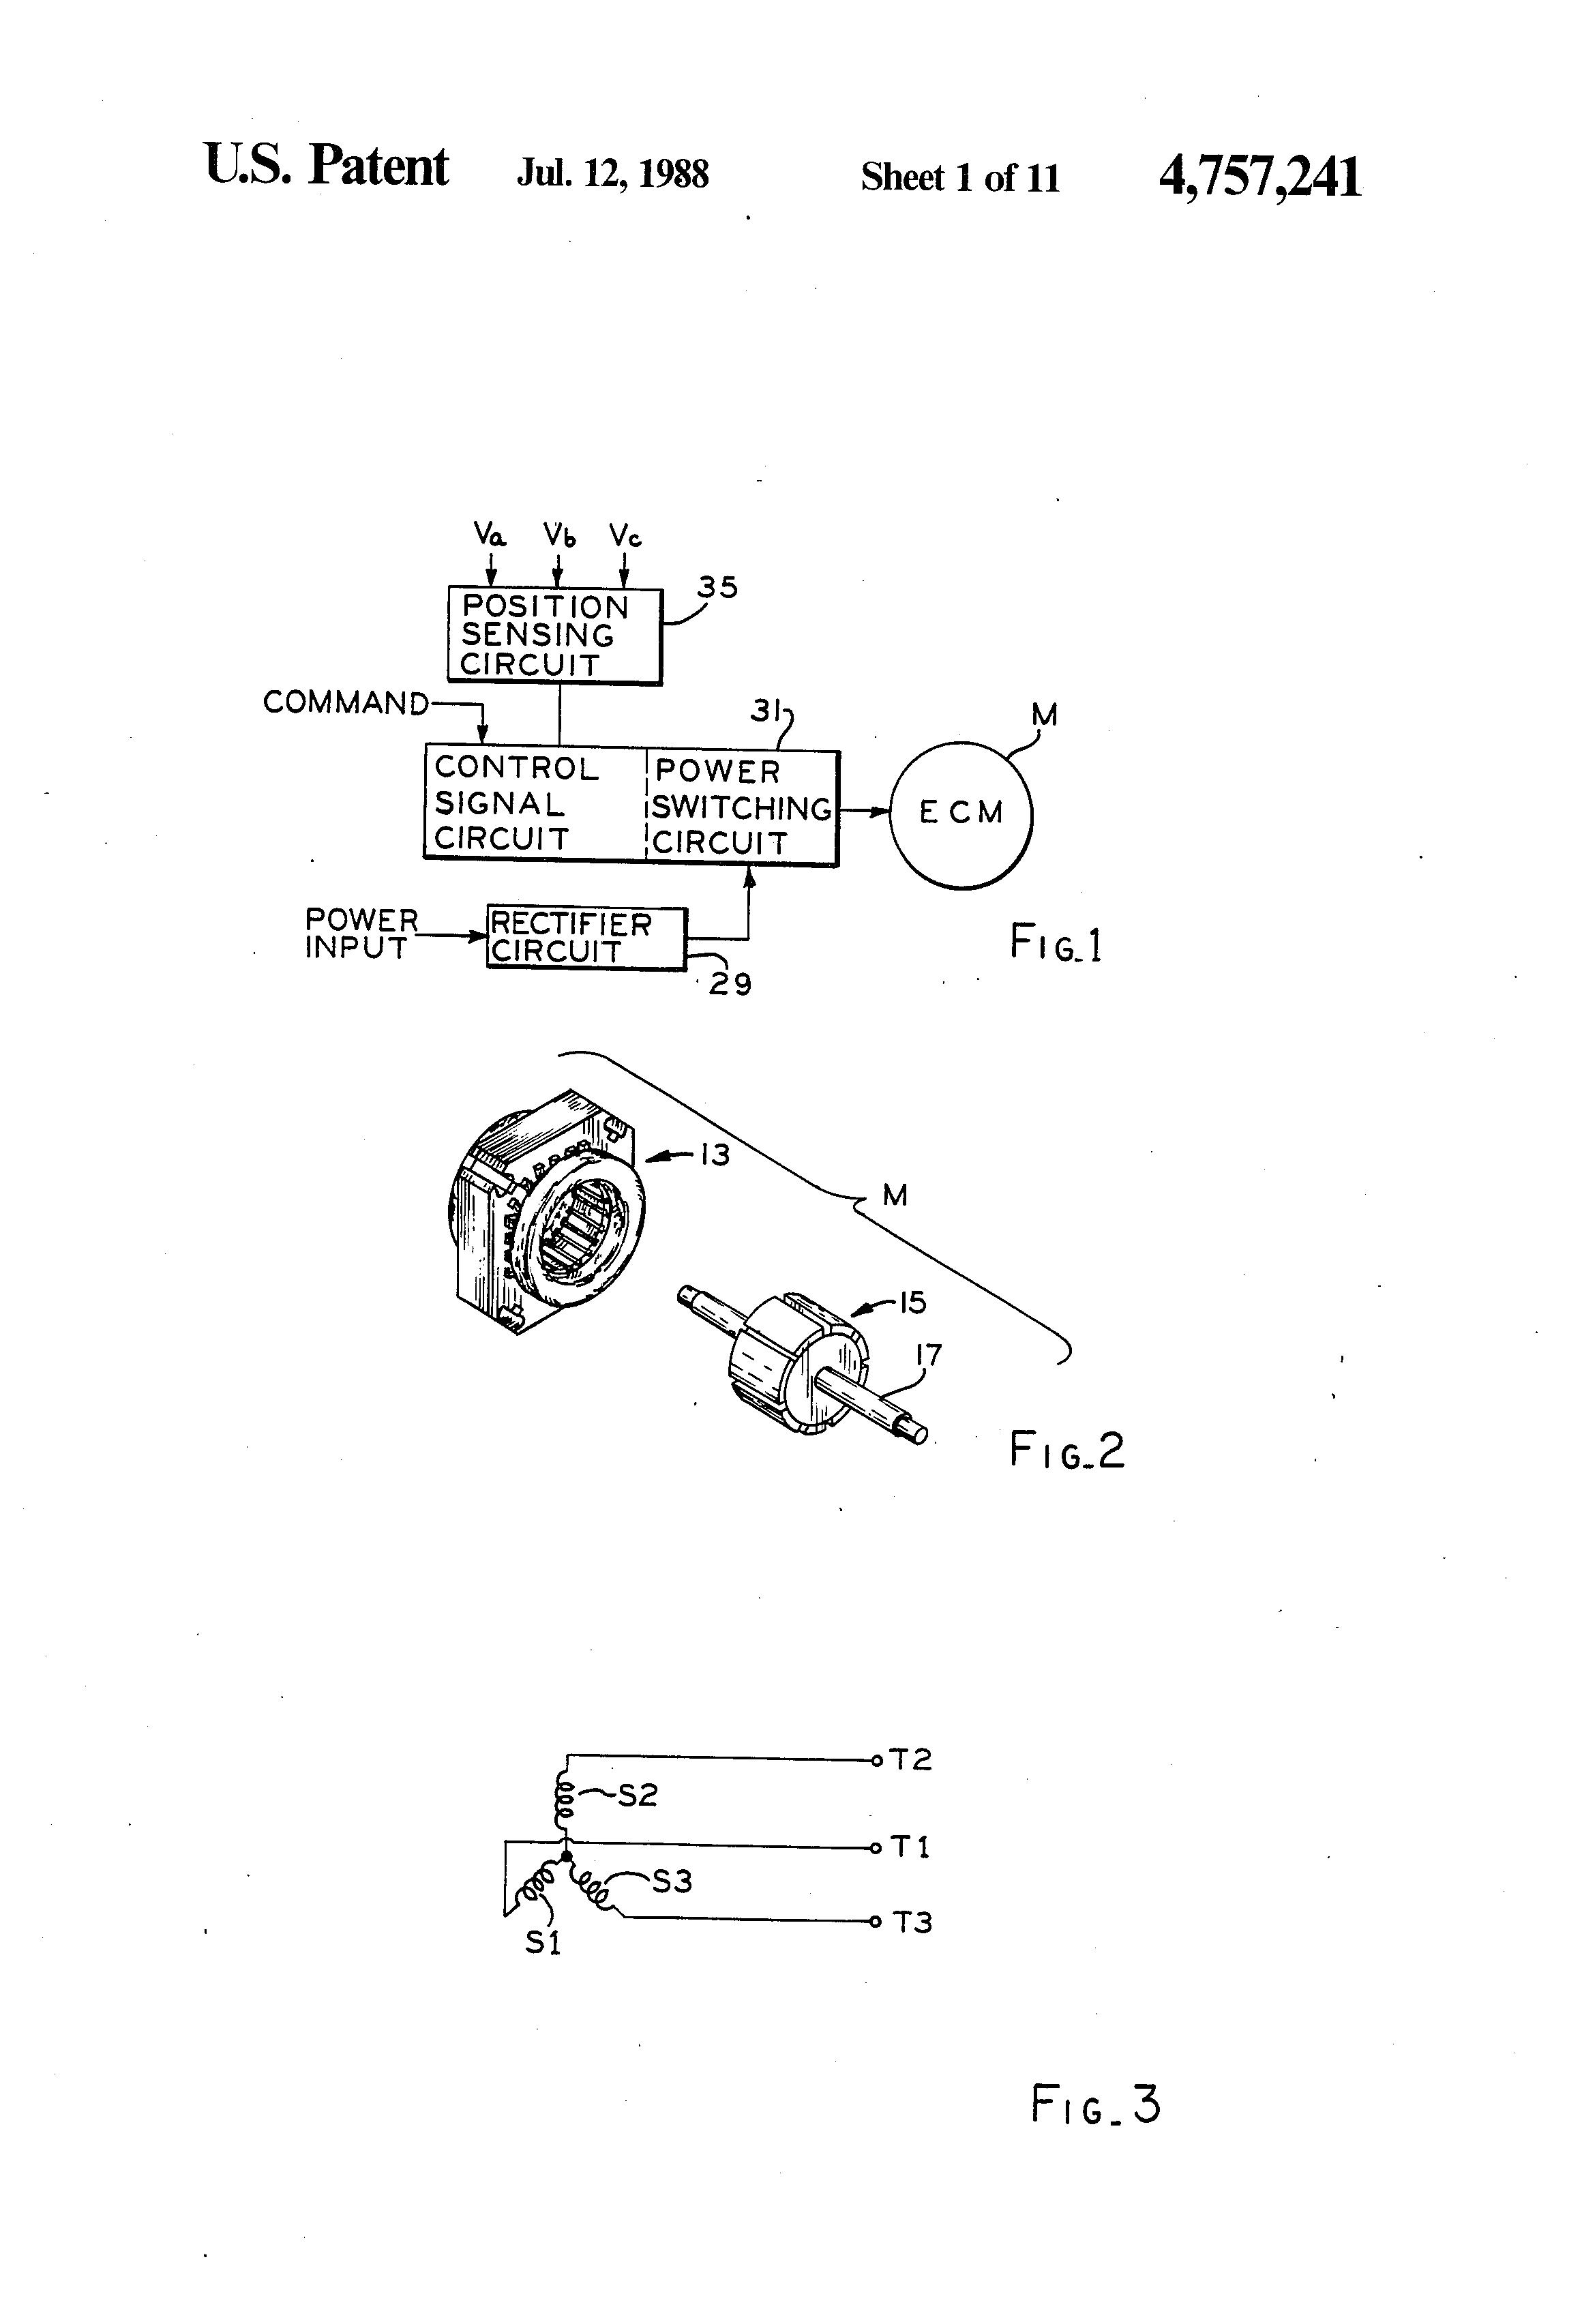 ecm motor control circuit